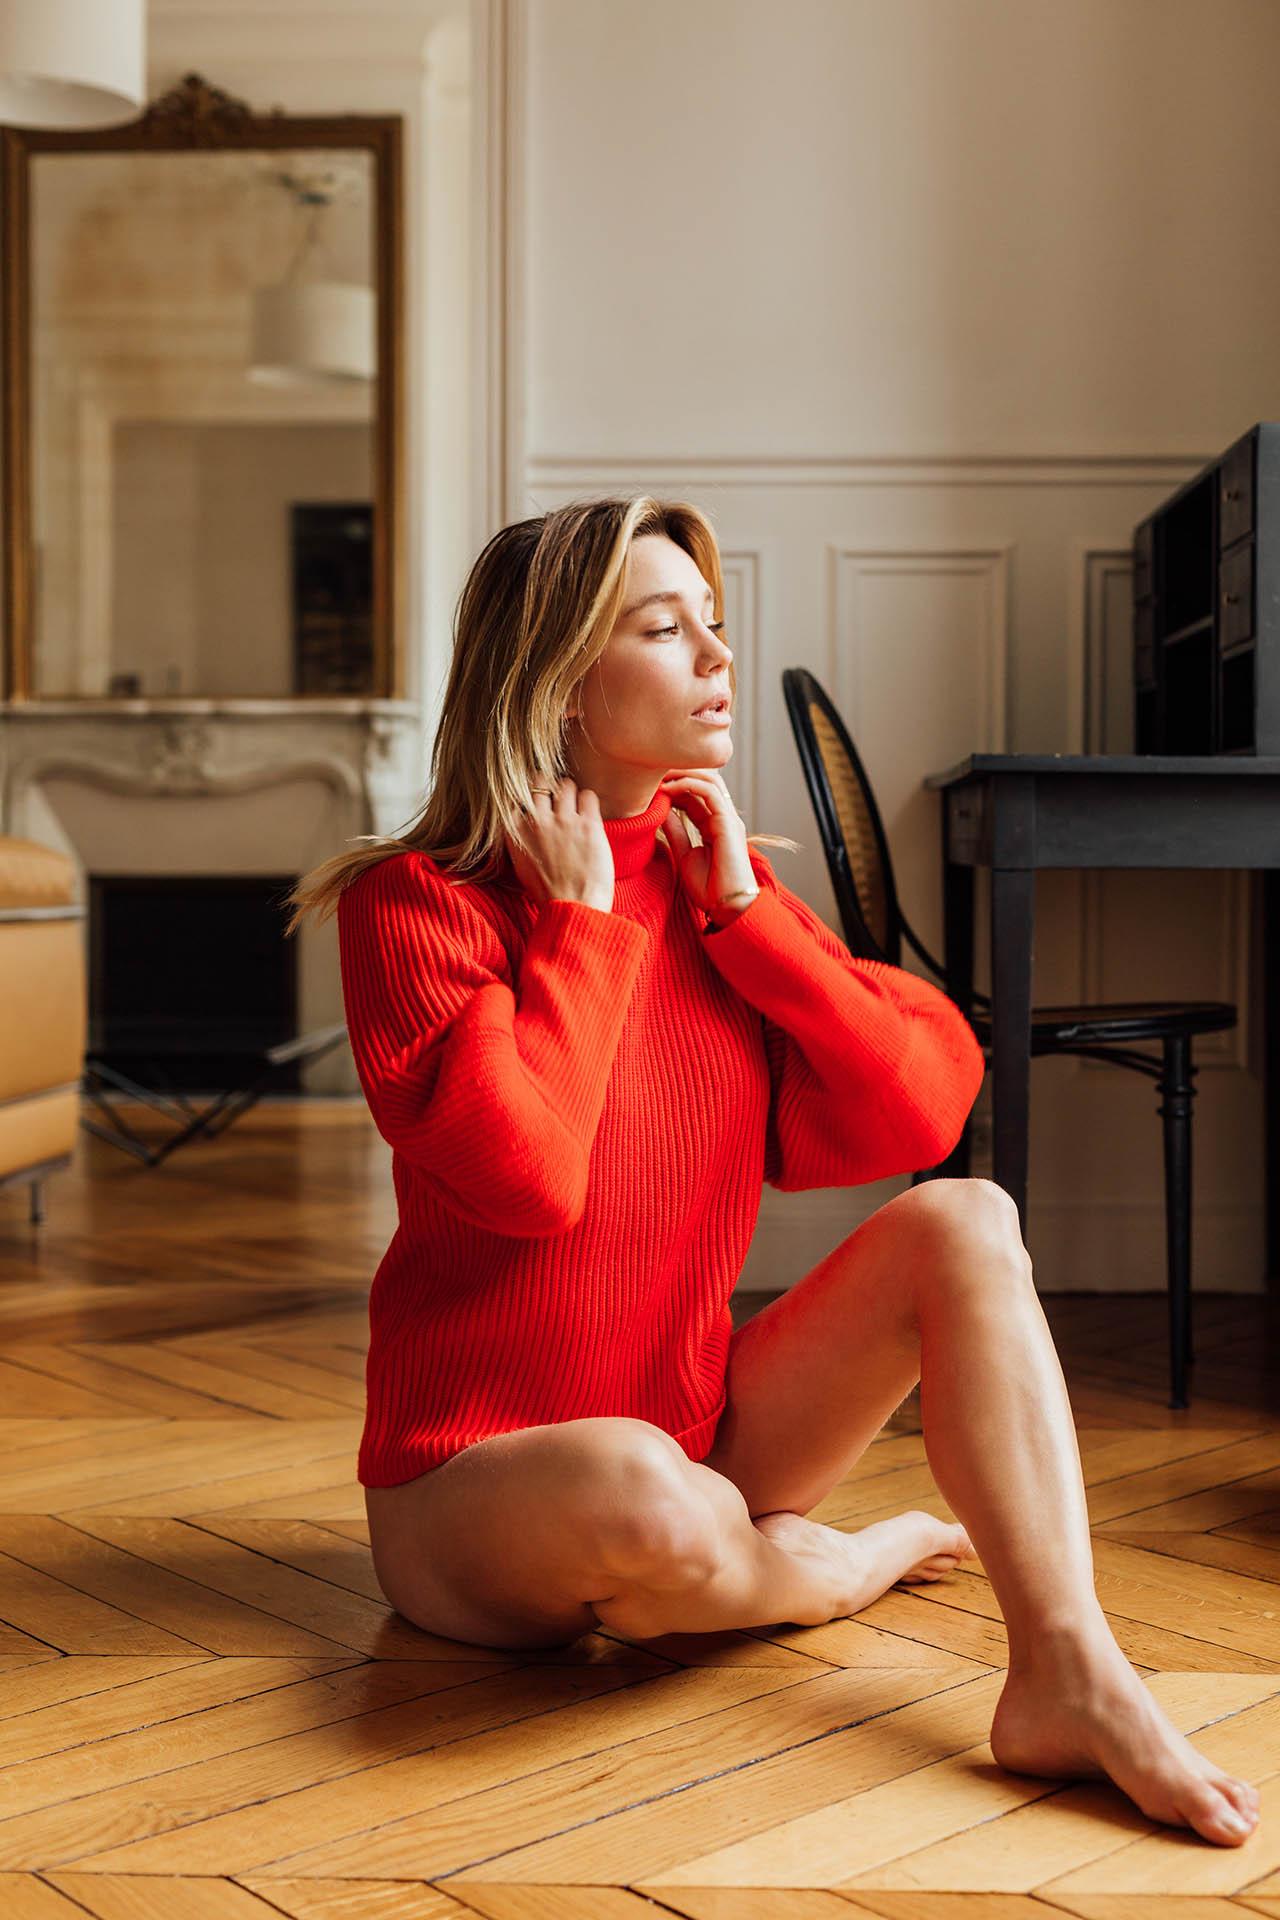 icemecri-Alison_Cossenet-lingerie-26